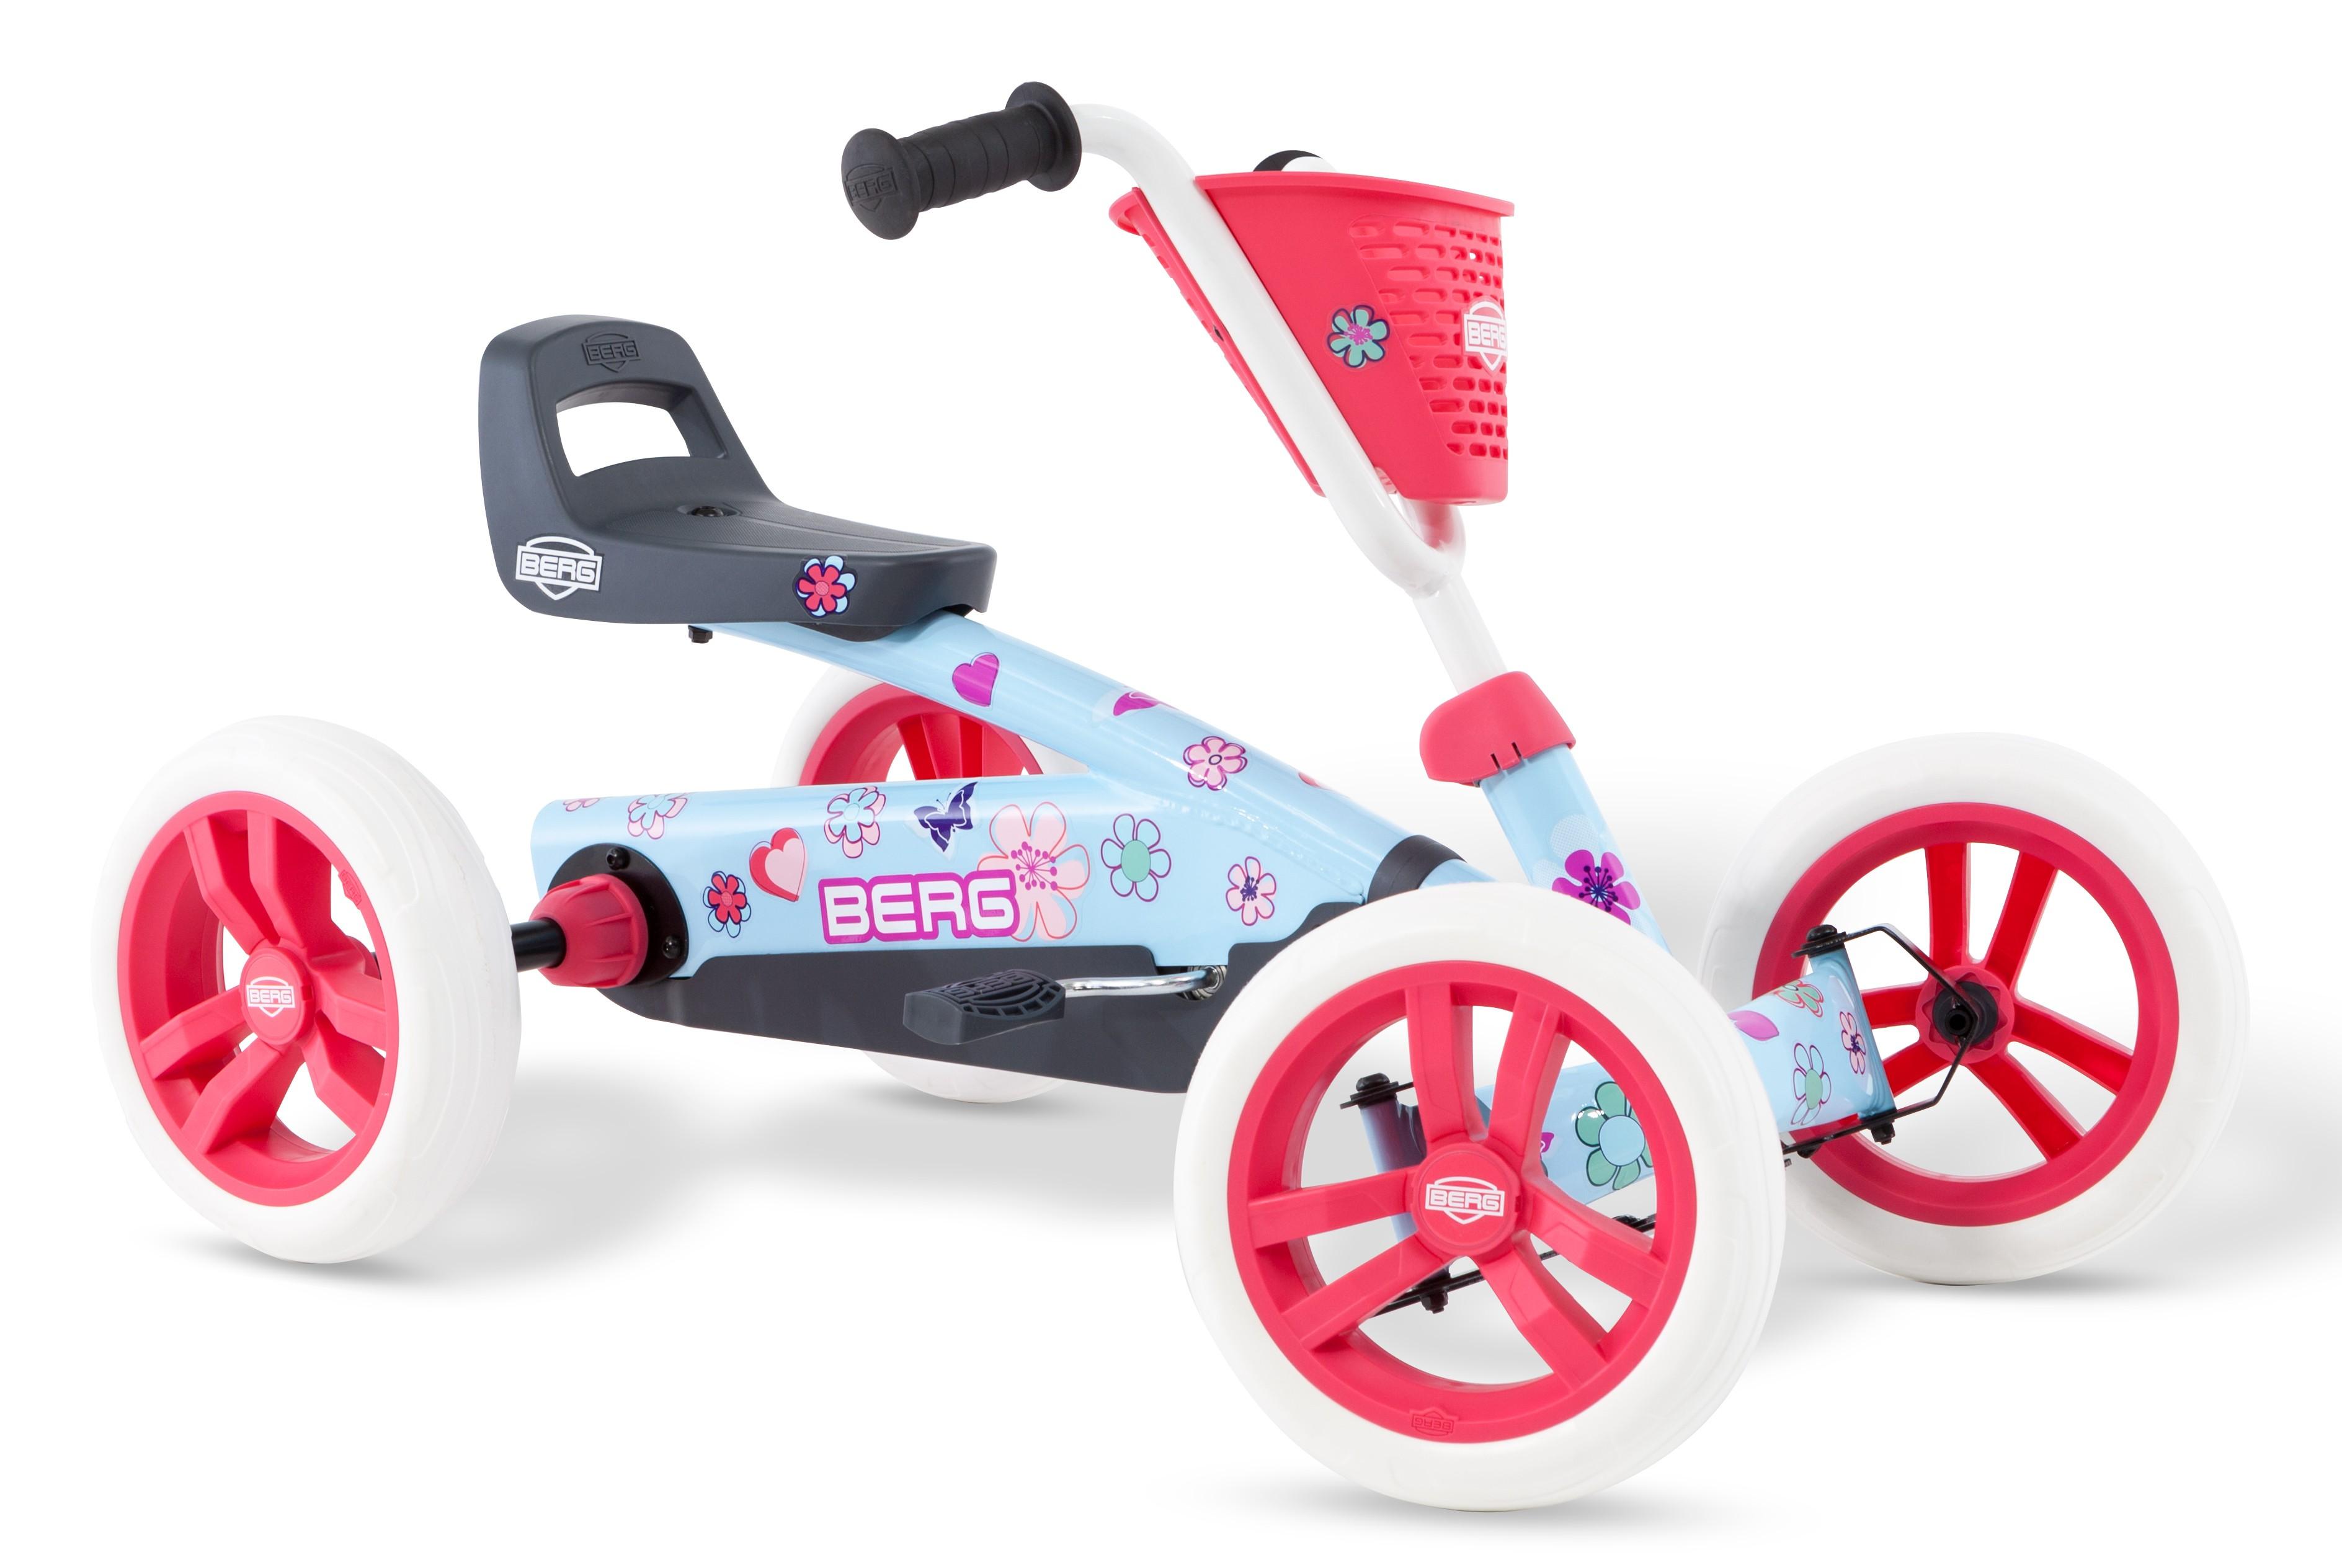 Gokart / Pedal-Gokart Buzzy Bloom BERG toys Bild 1